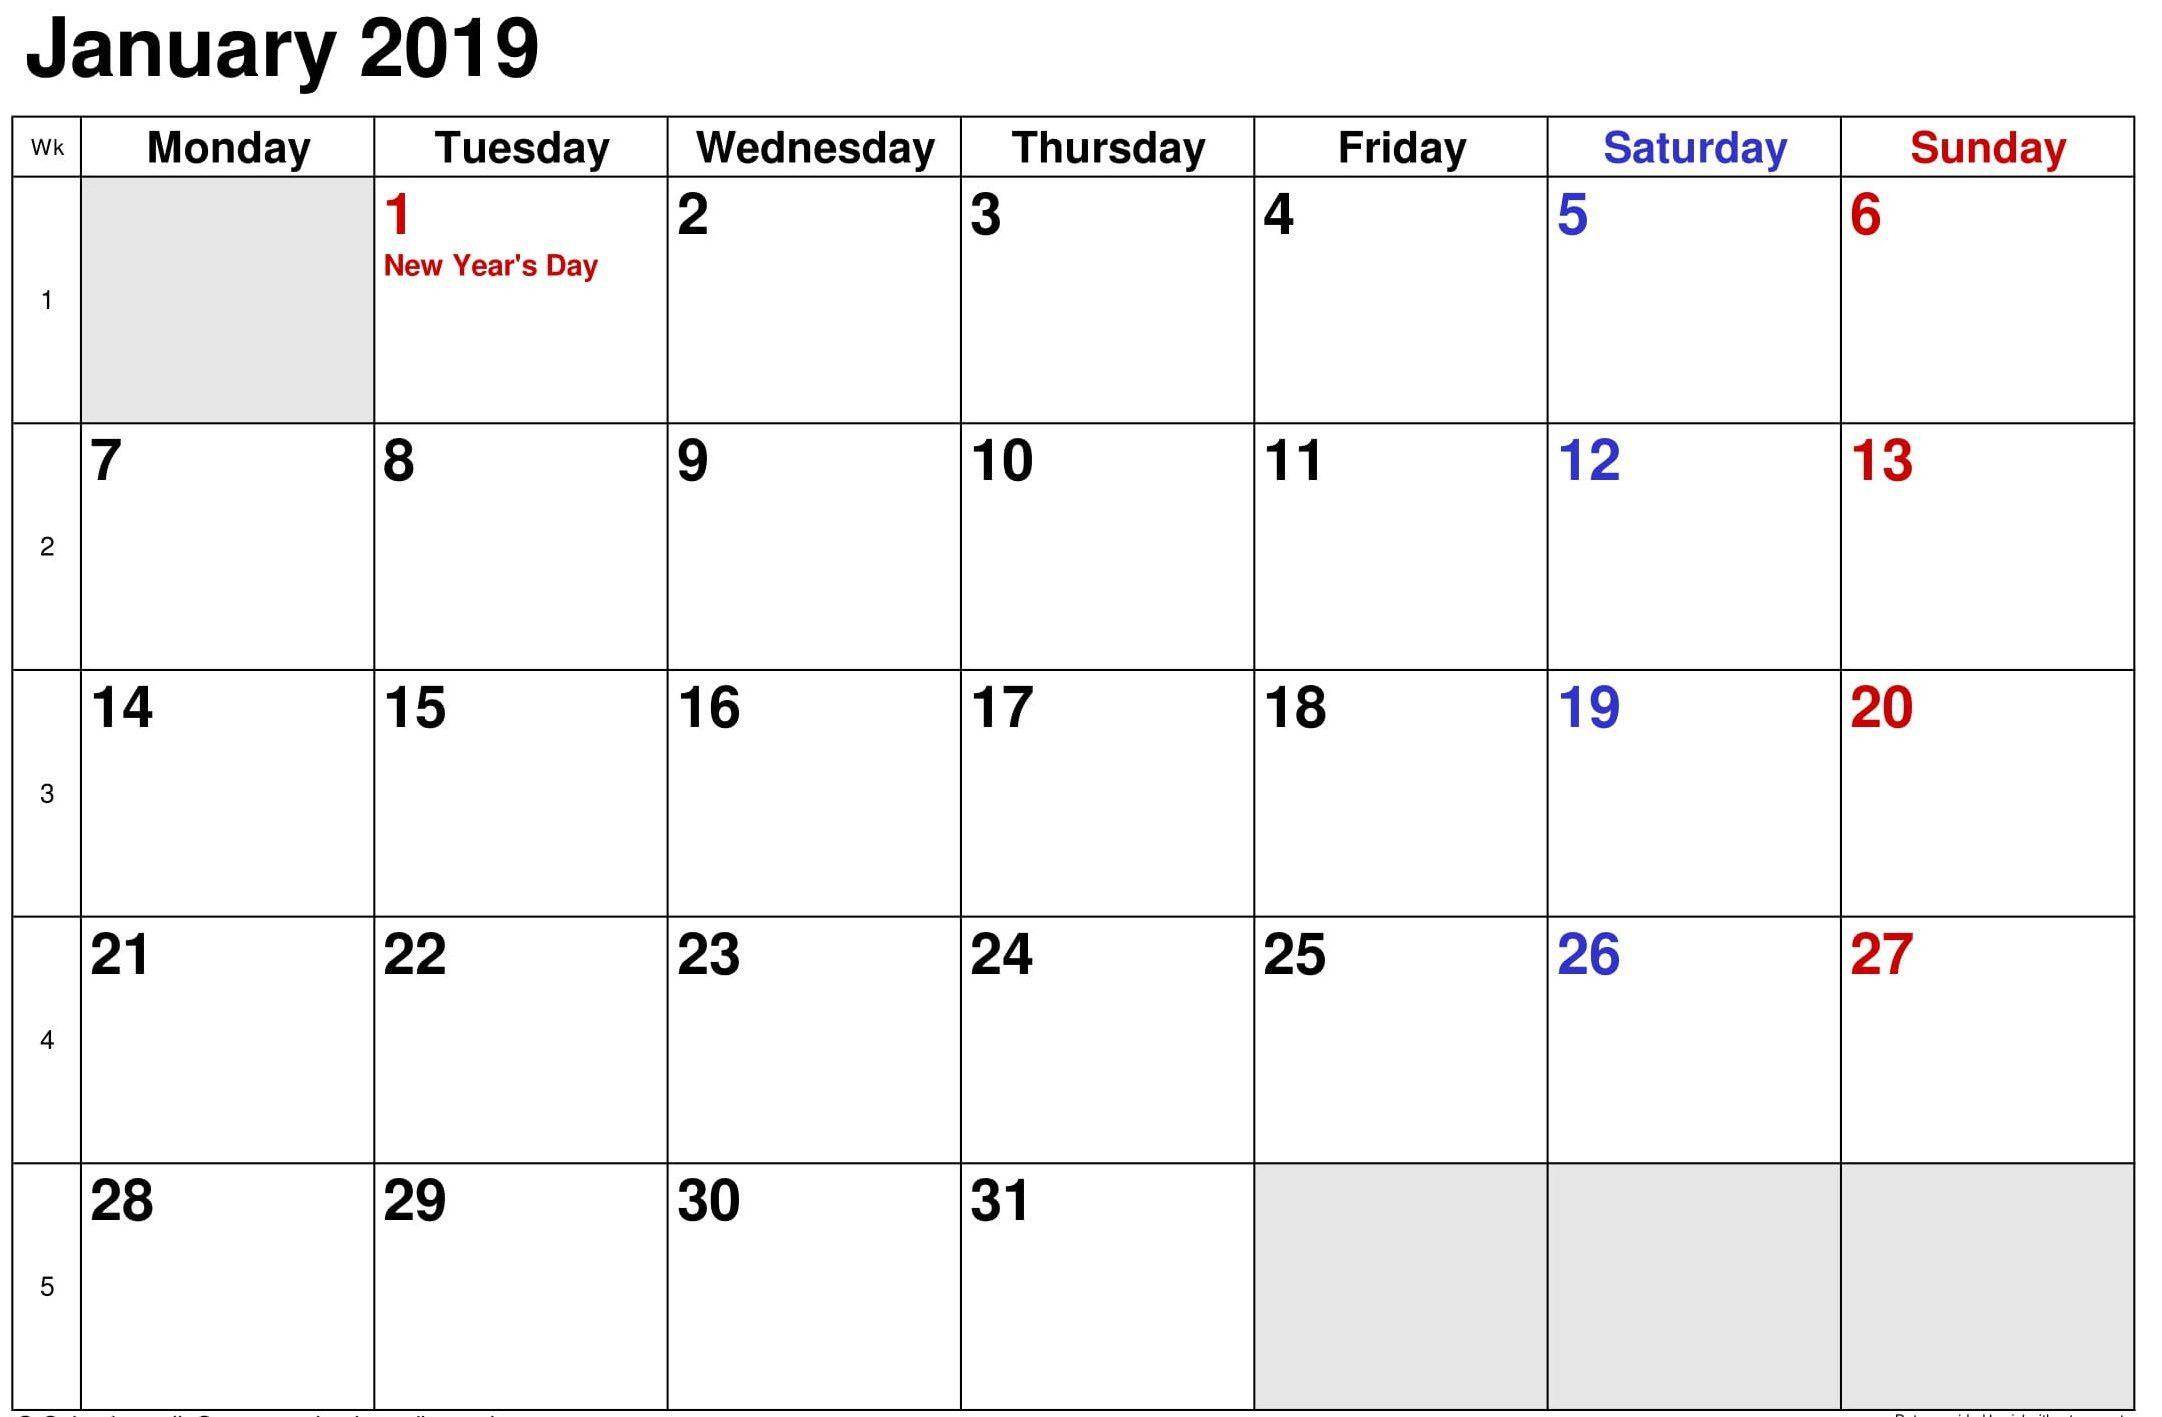 January 2019 Calendar Printable With Holiays